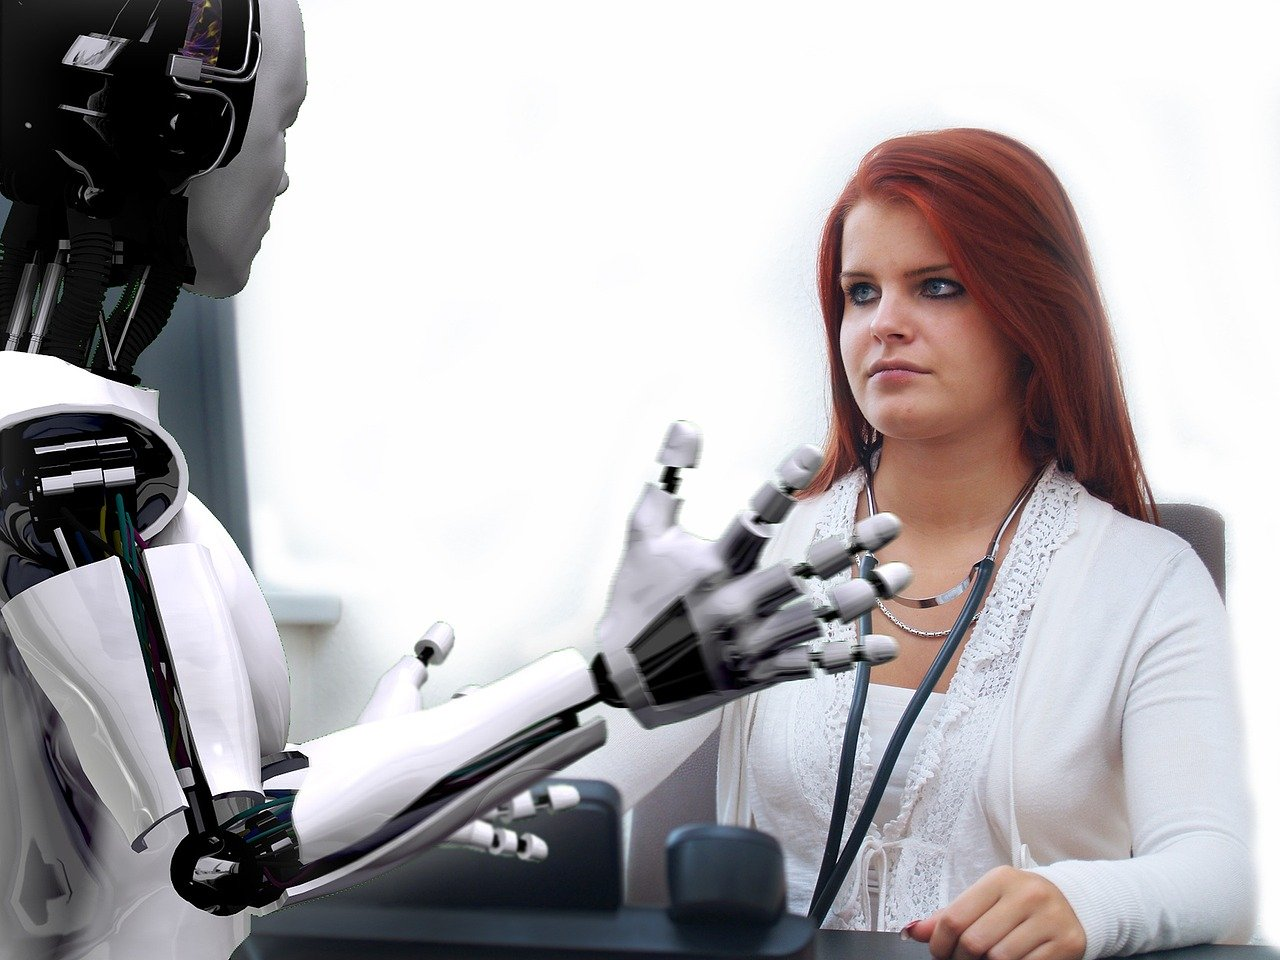 Hvad er fremtiden for digitaliseringen?